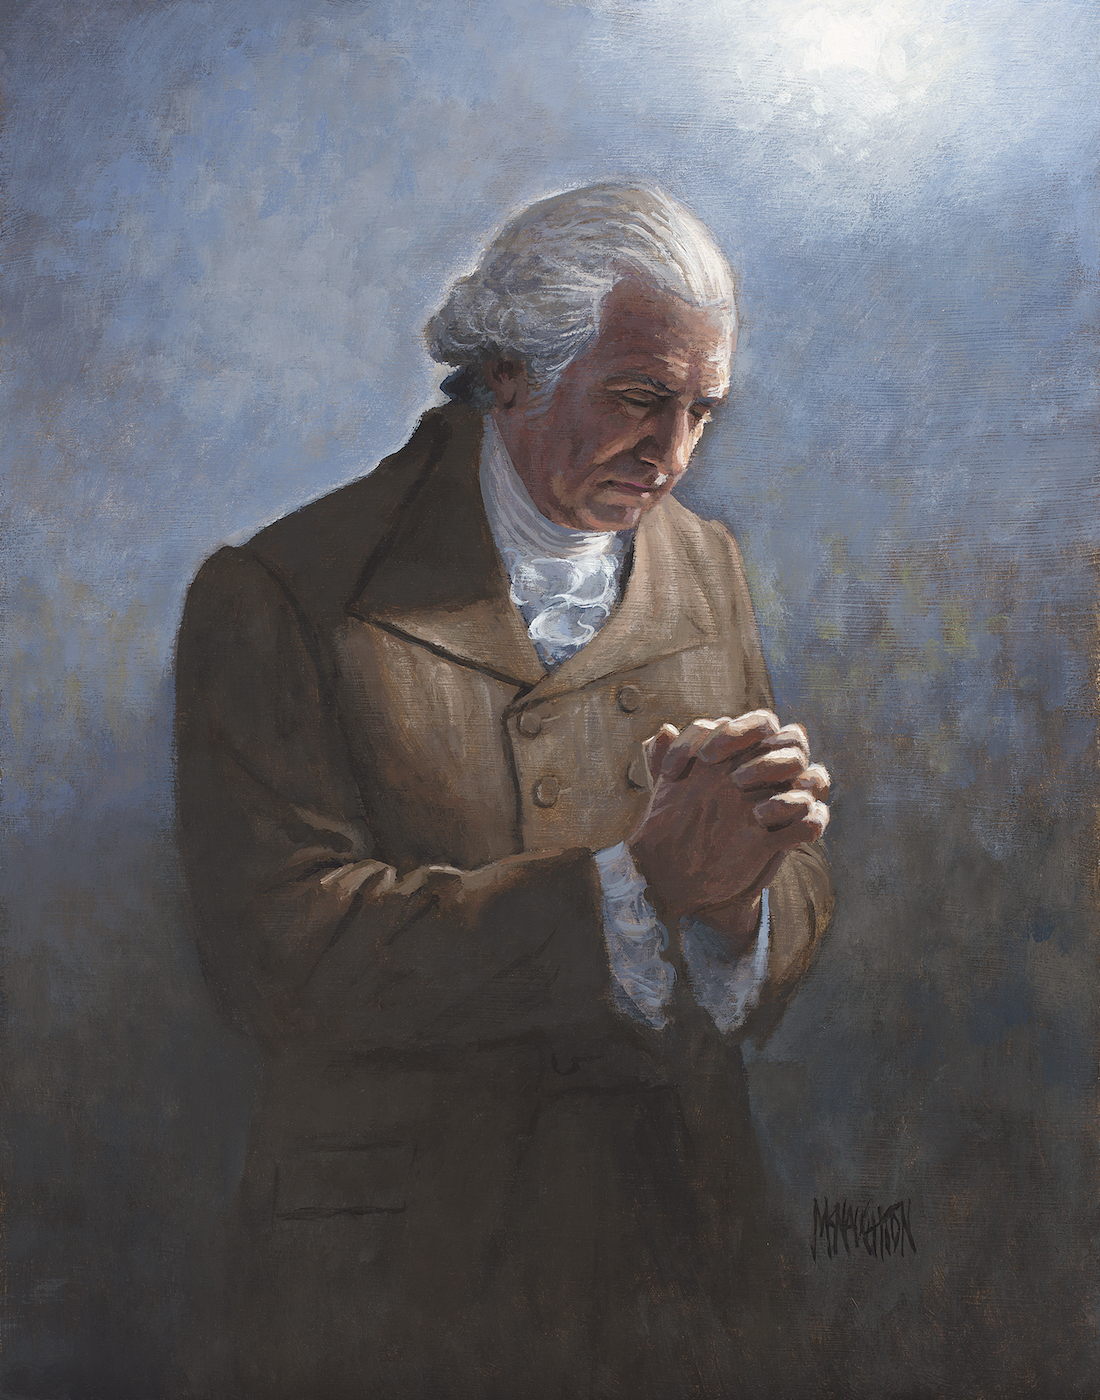 wasnington-s-prayer1.jpg